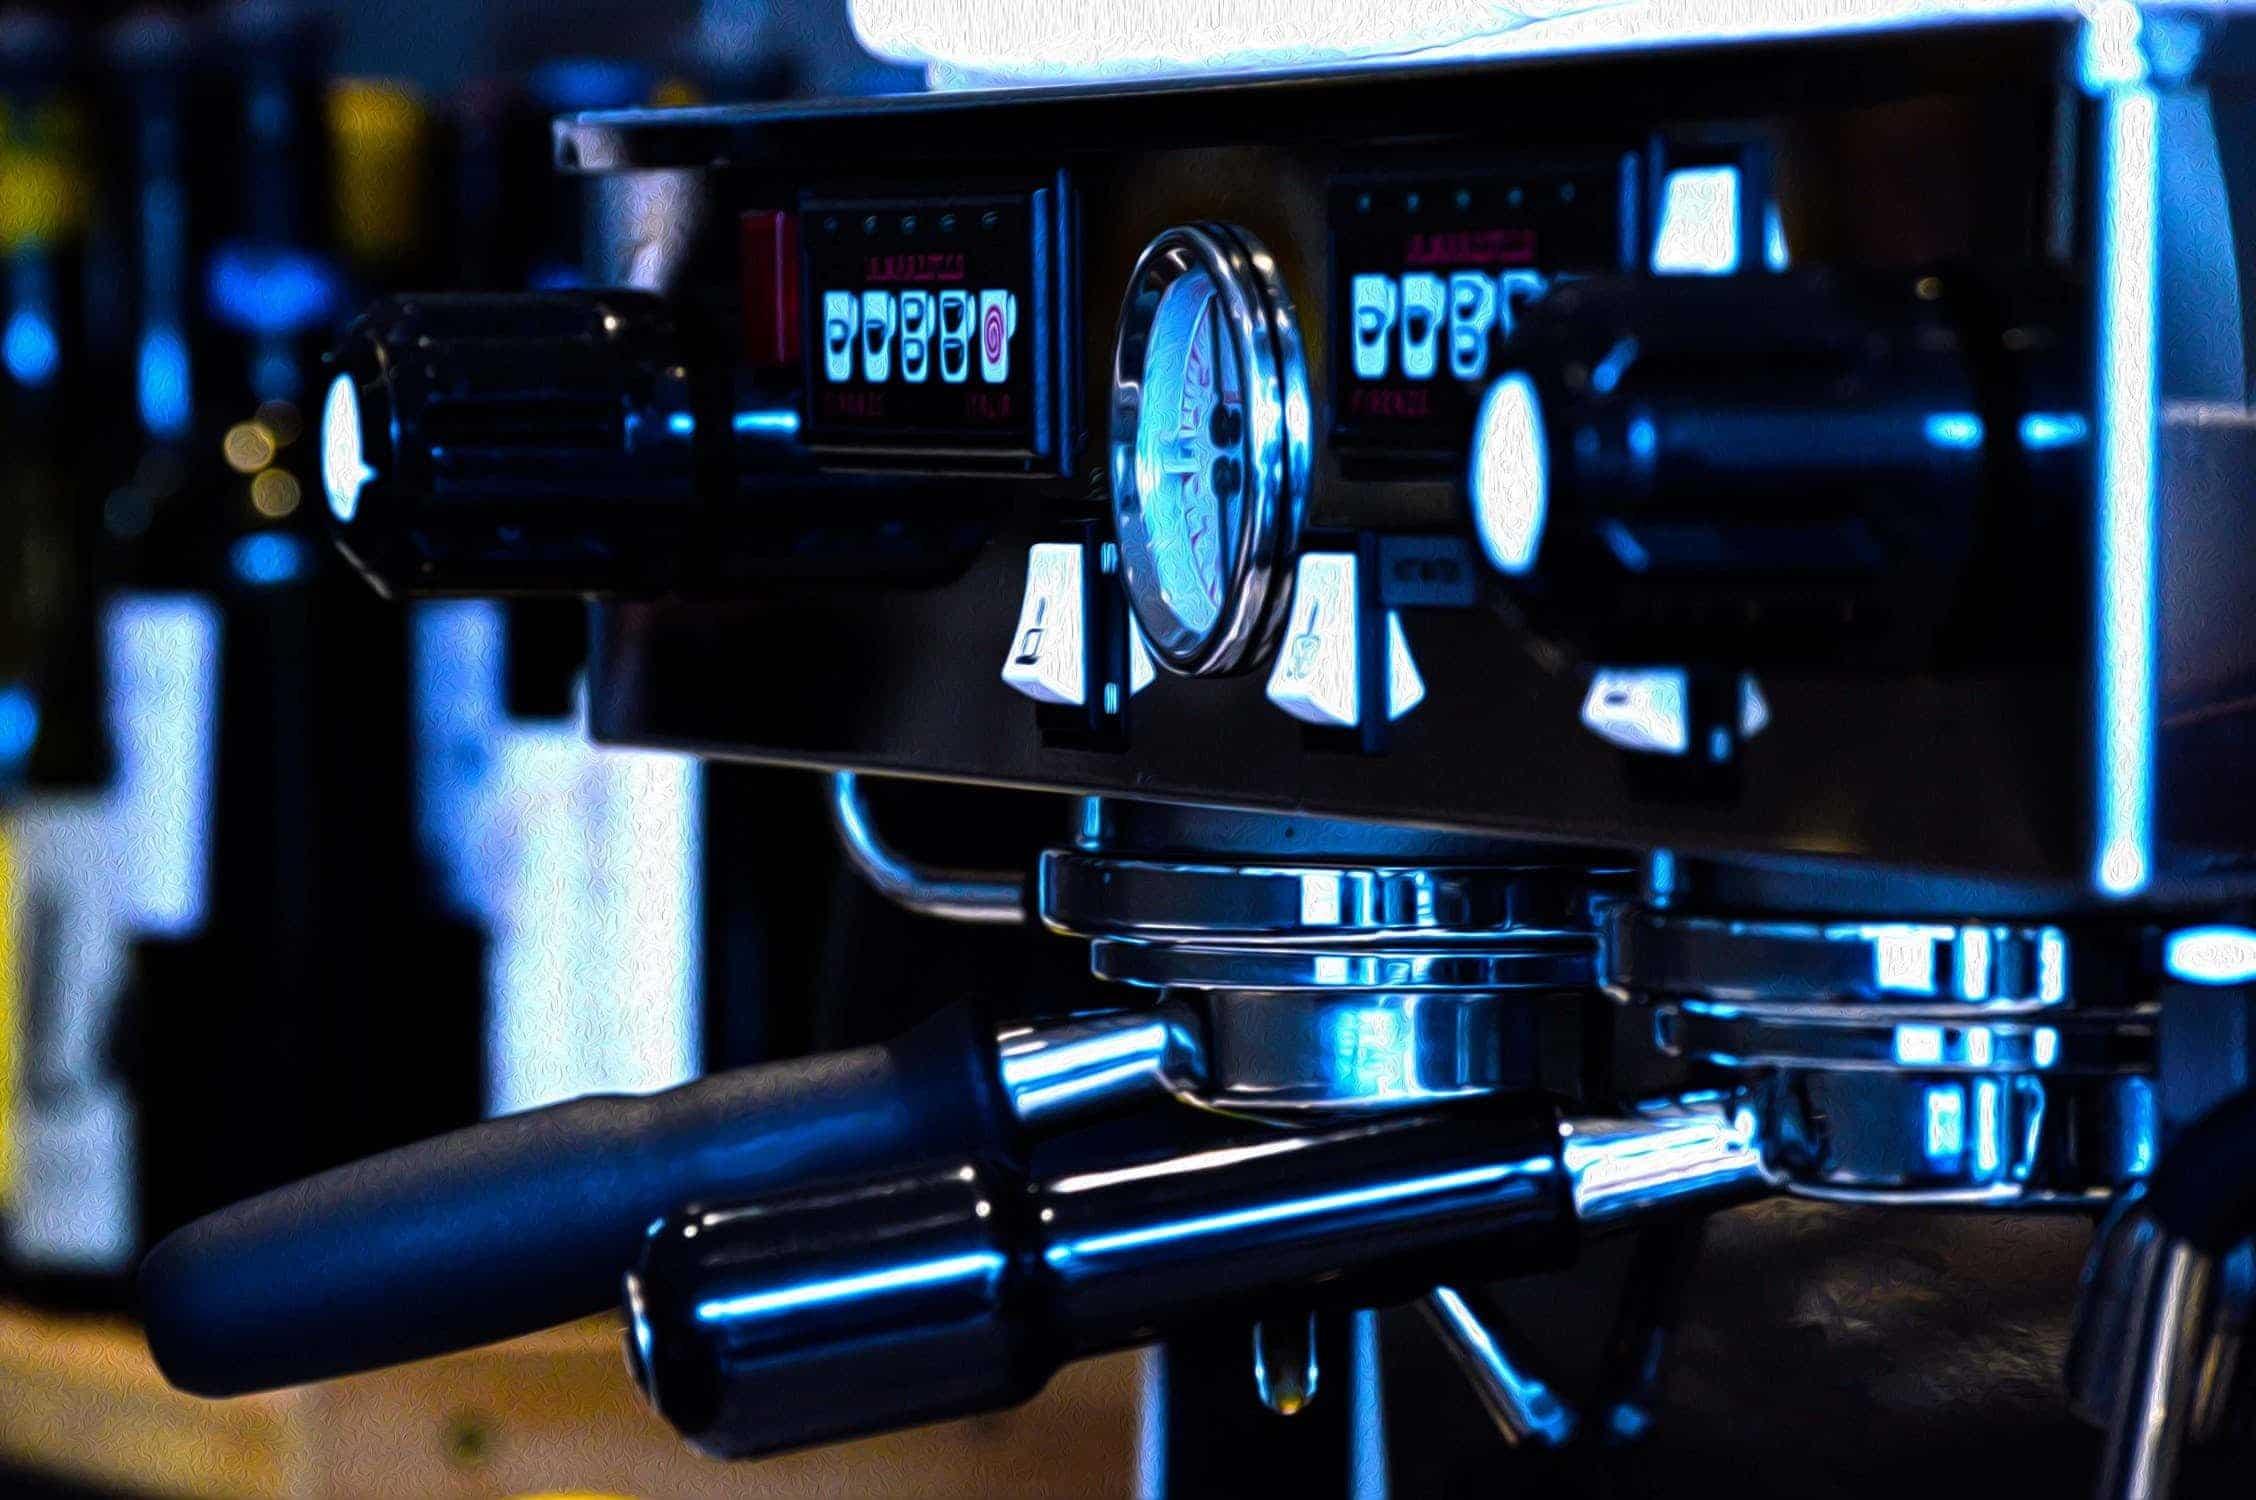 7 Reasons You Need A Good Espresso Machine